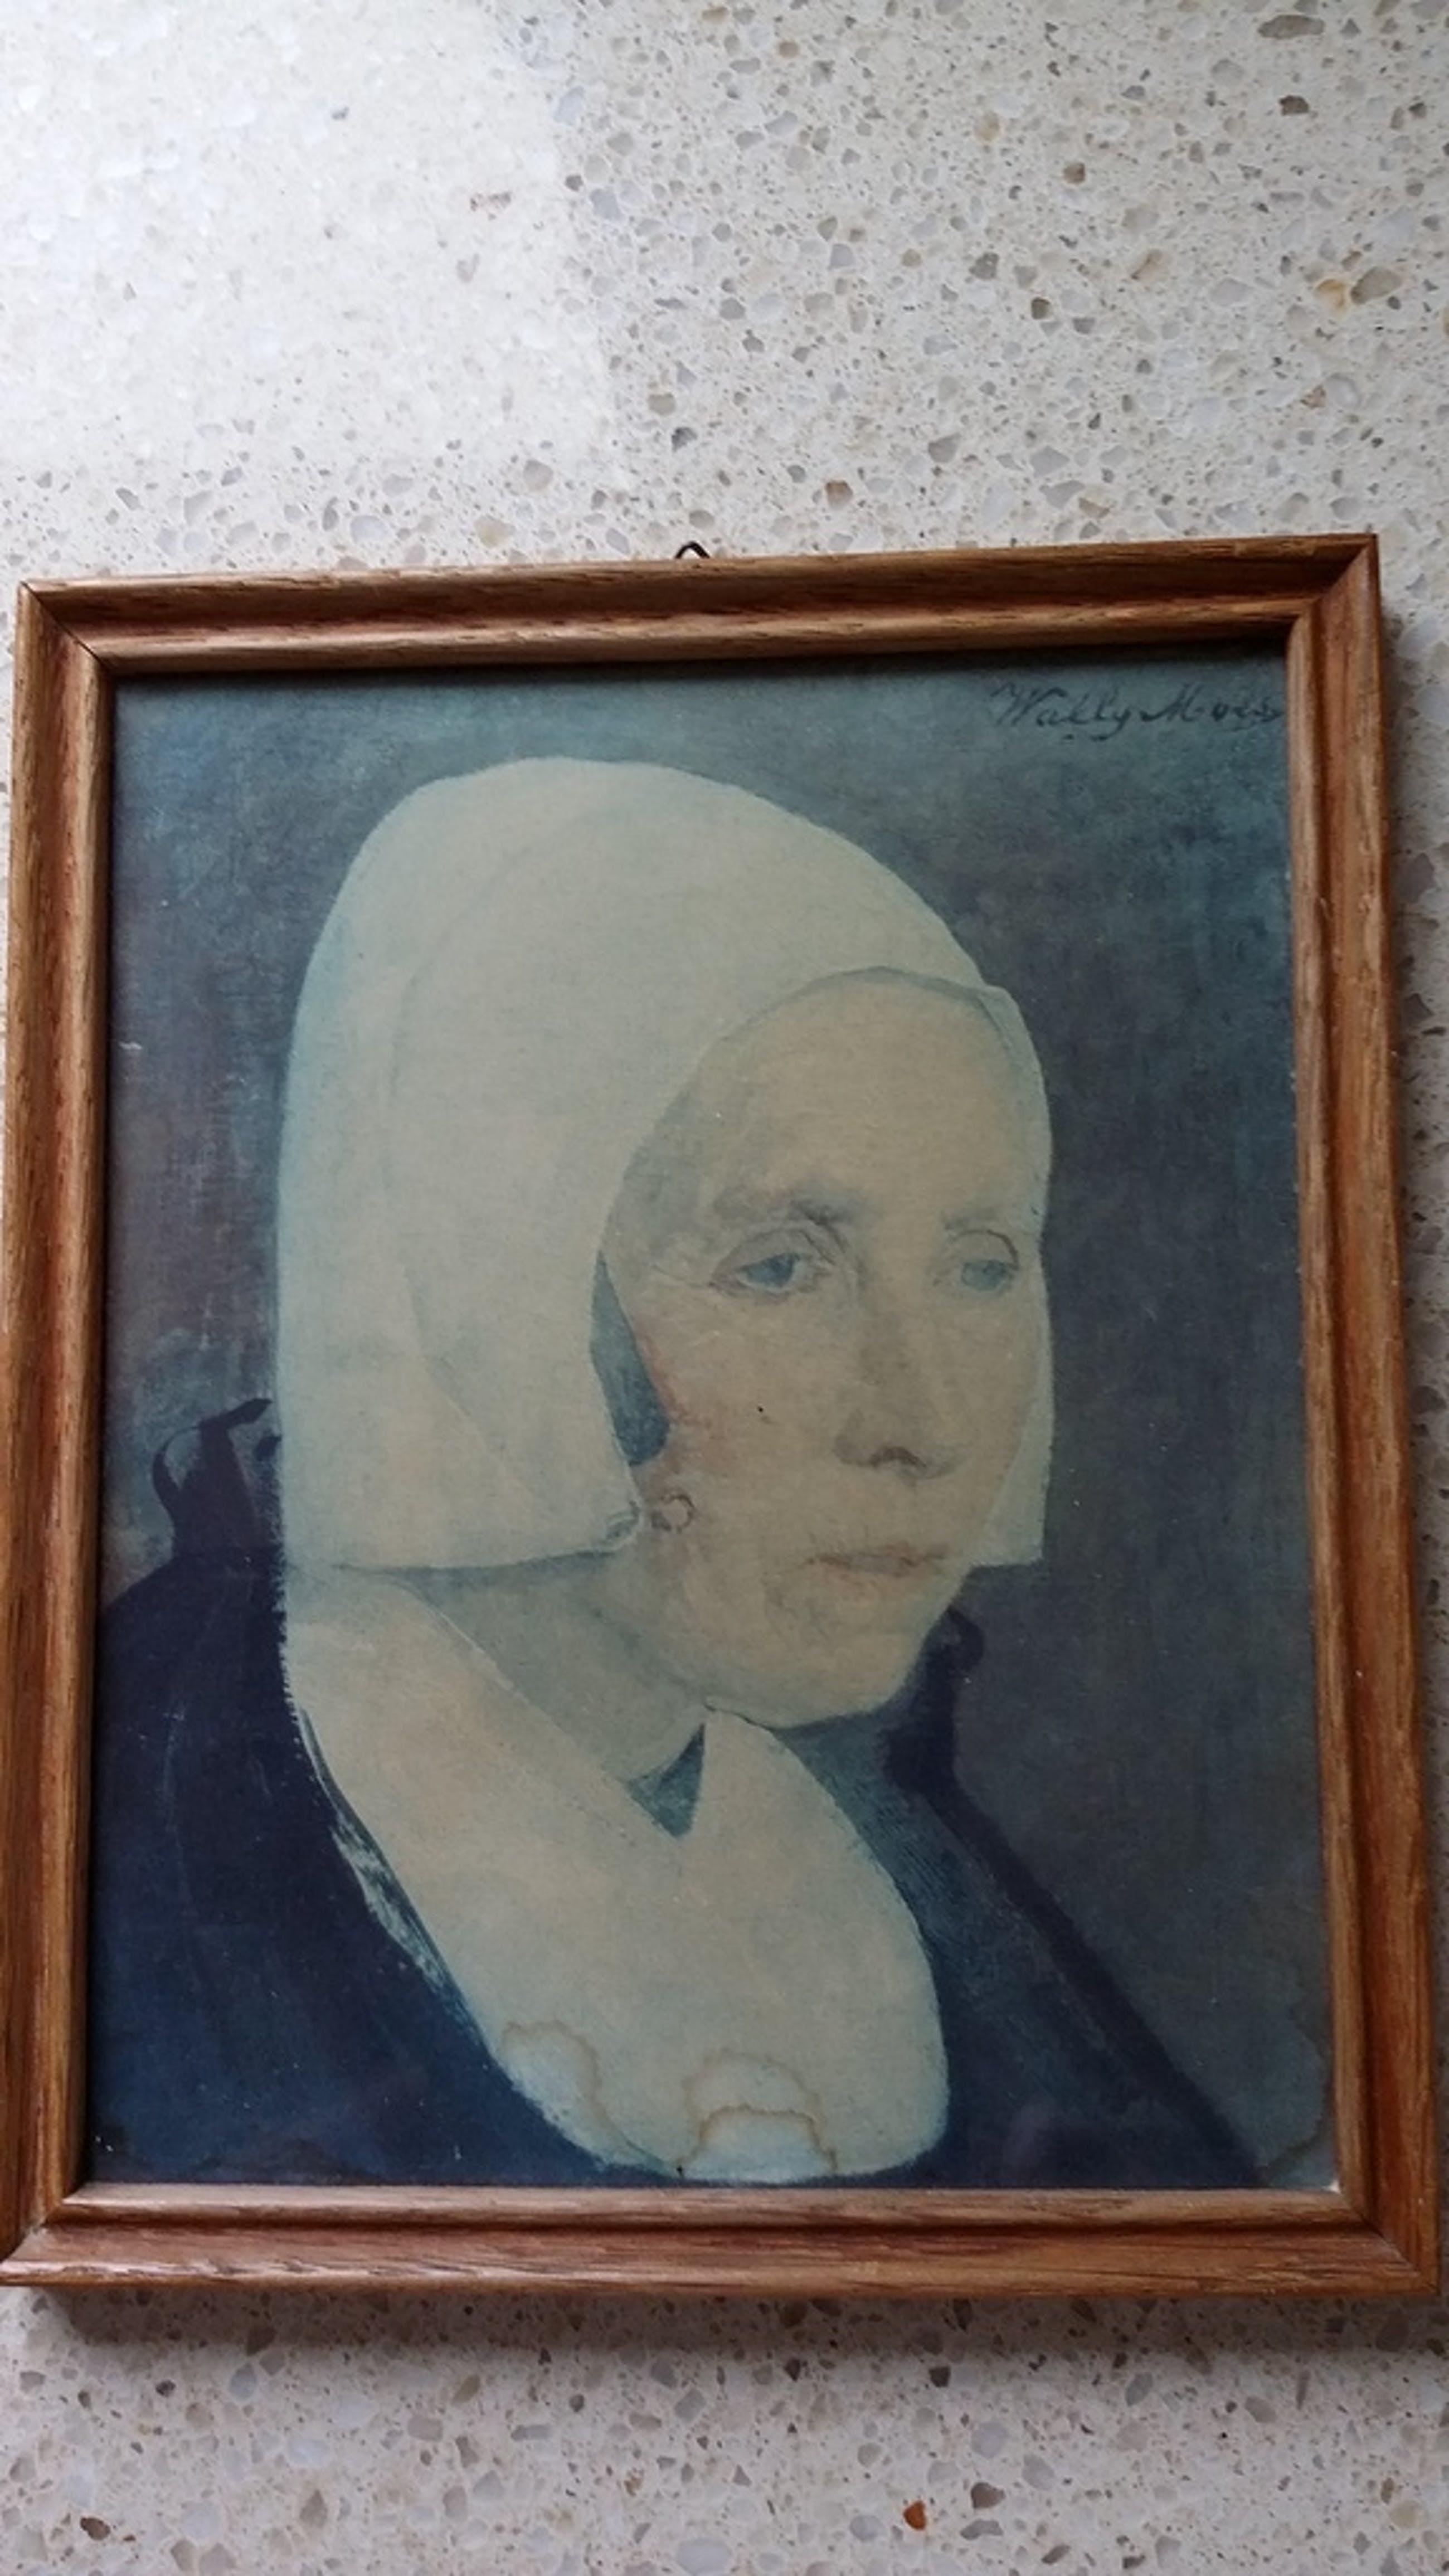 Wally Moes Aquarel Portret dame in klederdracht kopen? Bied vanaf 500!